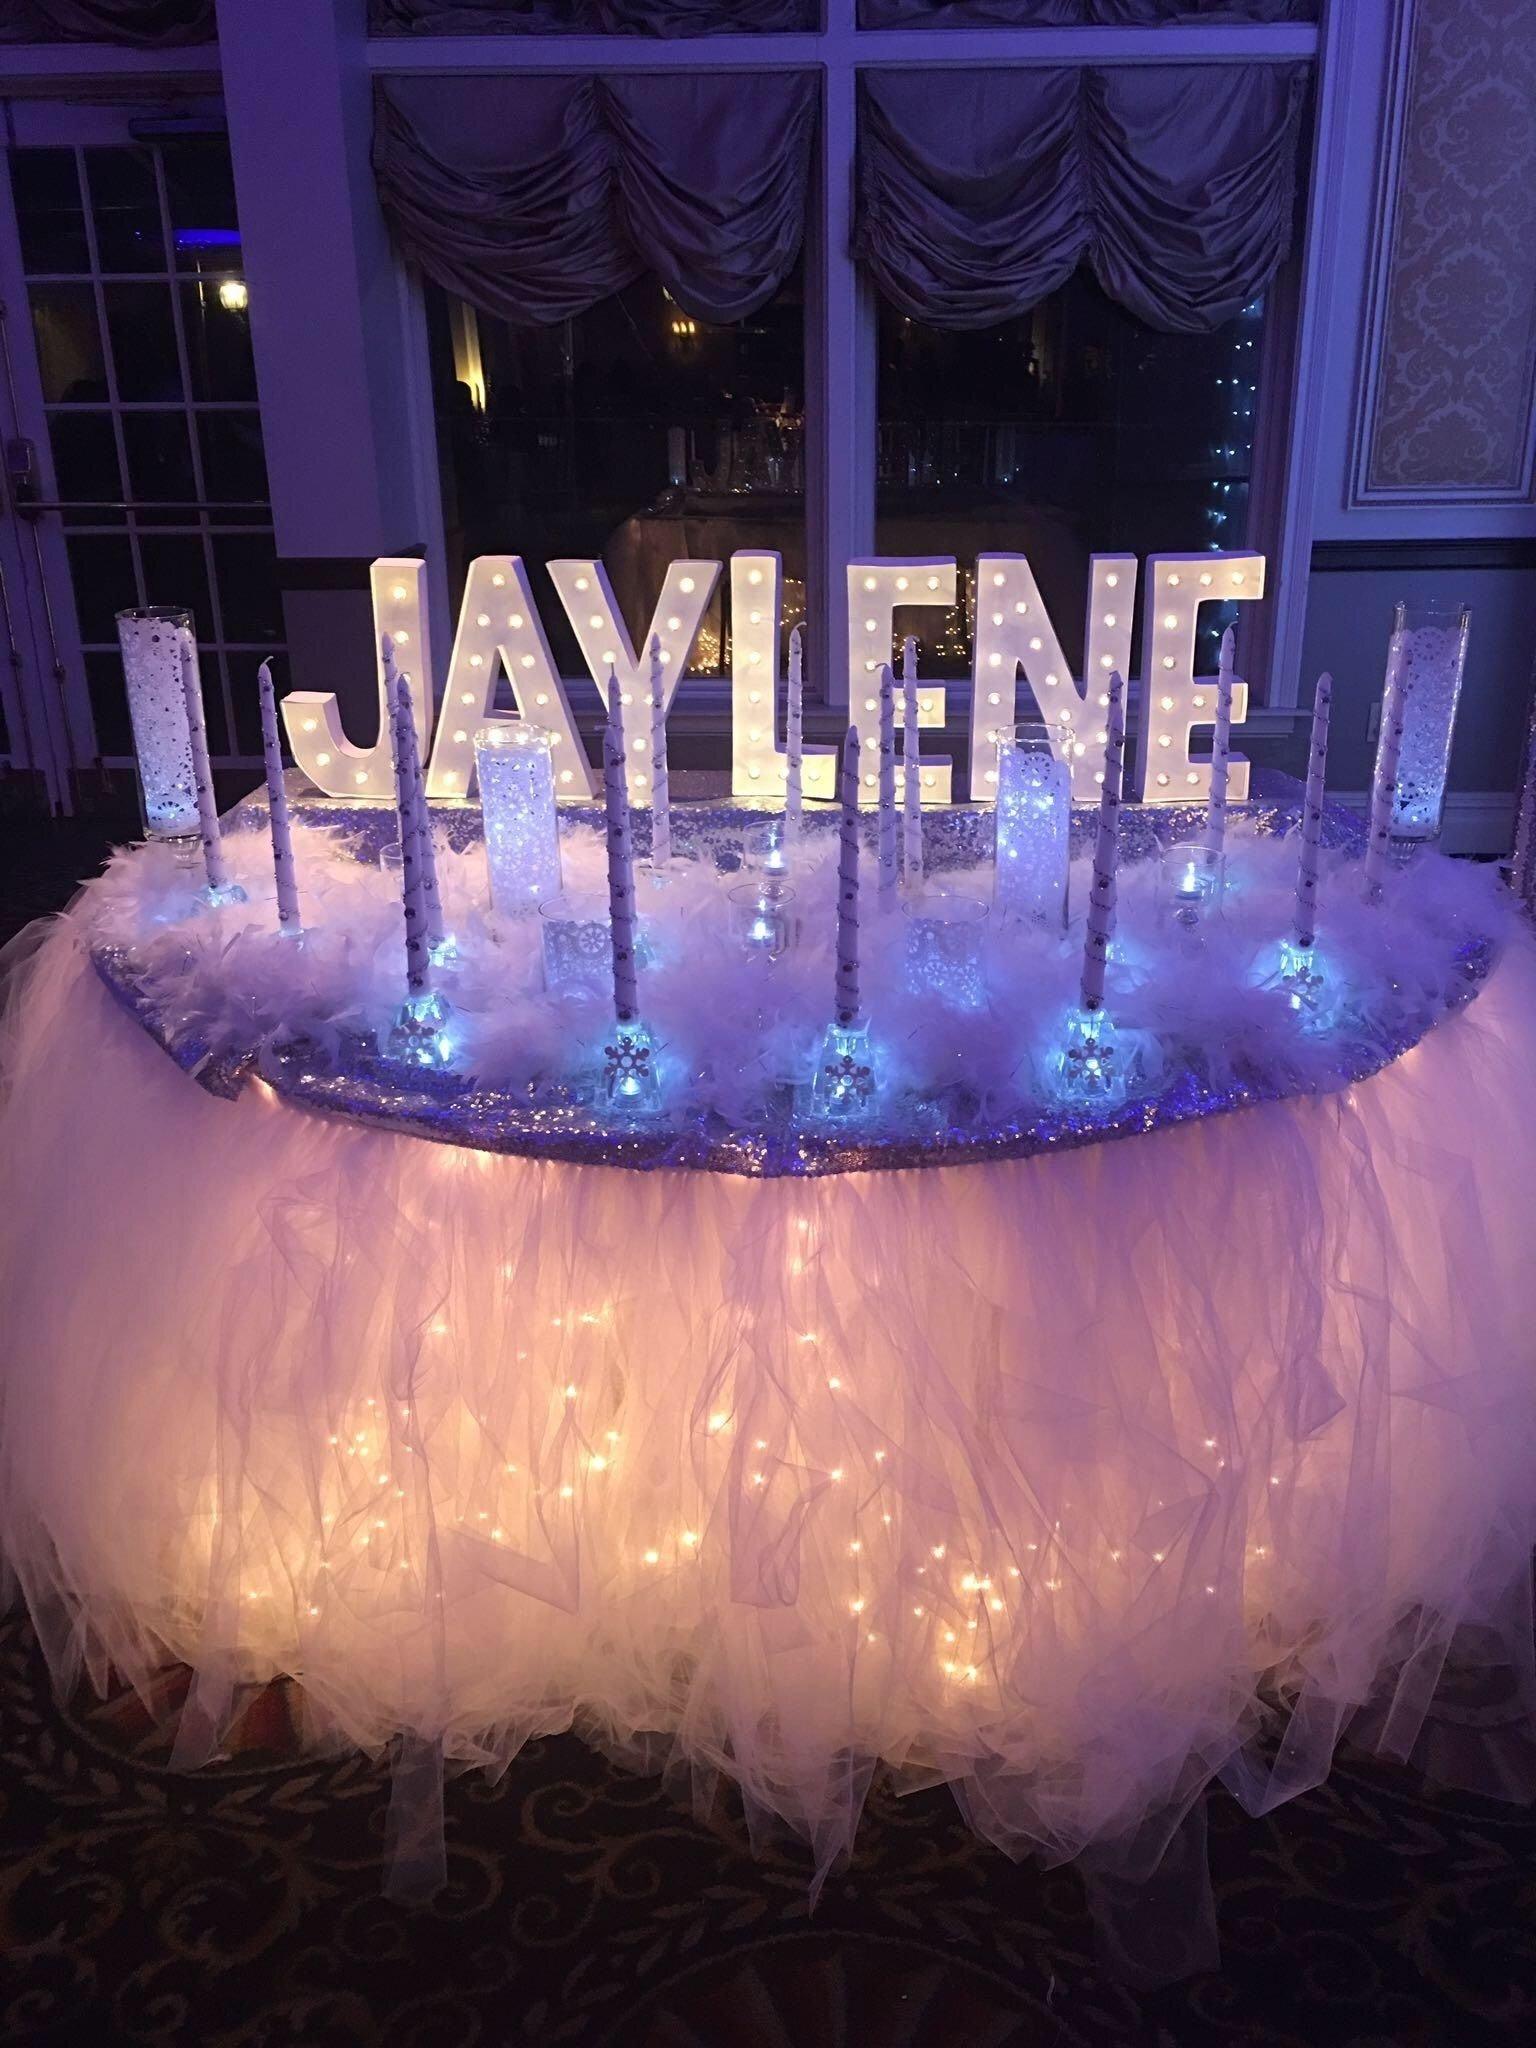 10 Fantastic Sweet 16 Ideas For Girls candle ceremony set up winter wonderland sweet 16 winter 8 2020